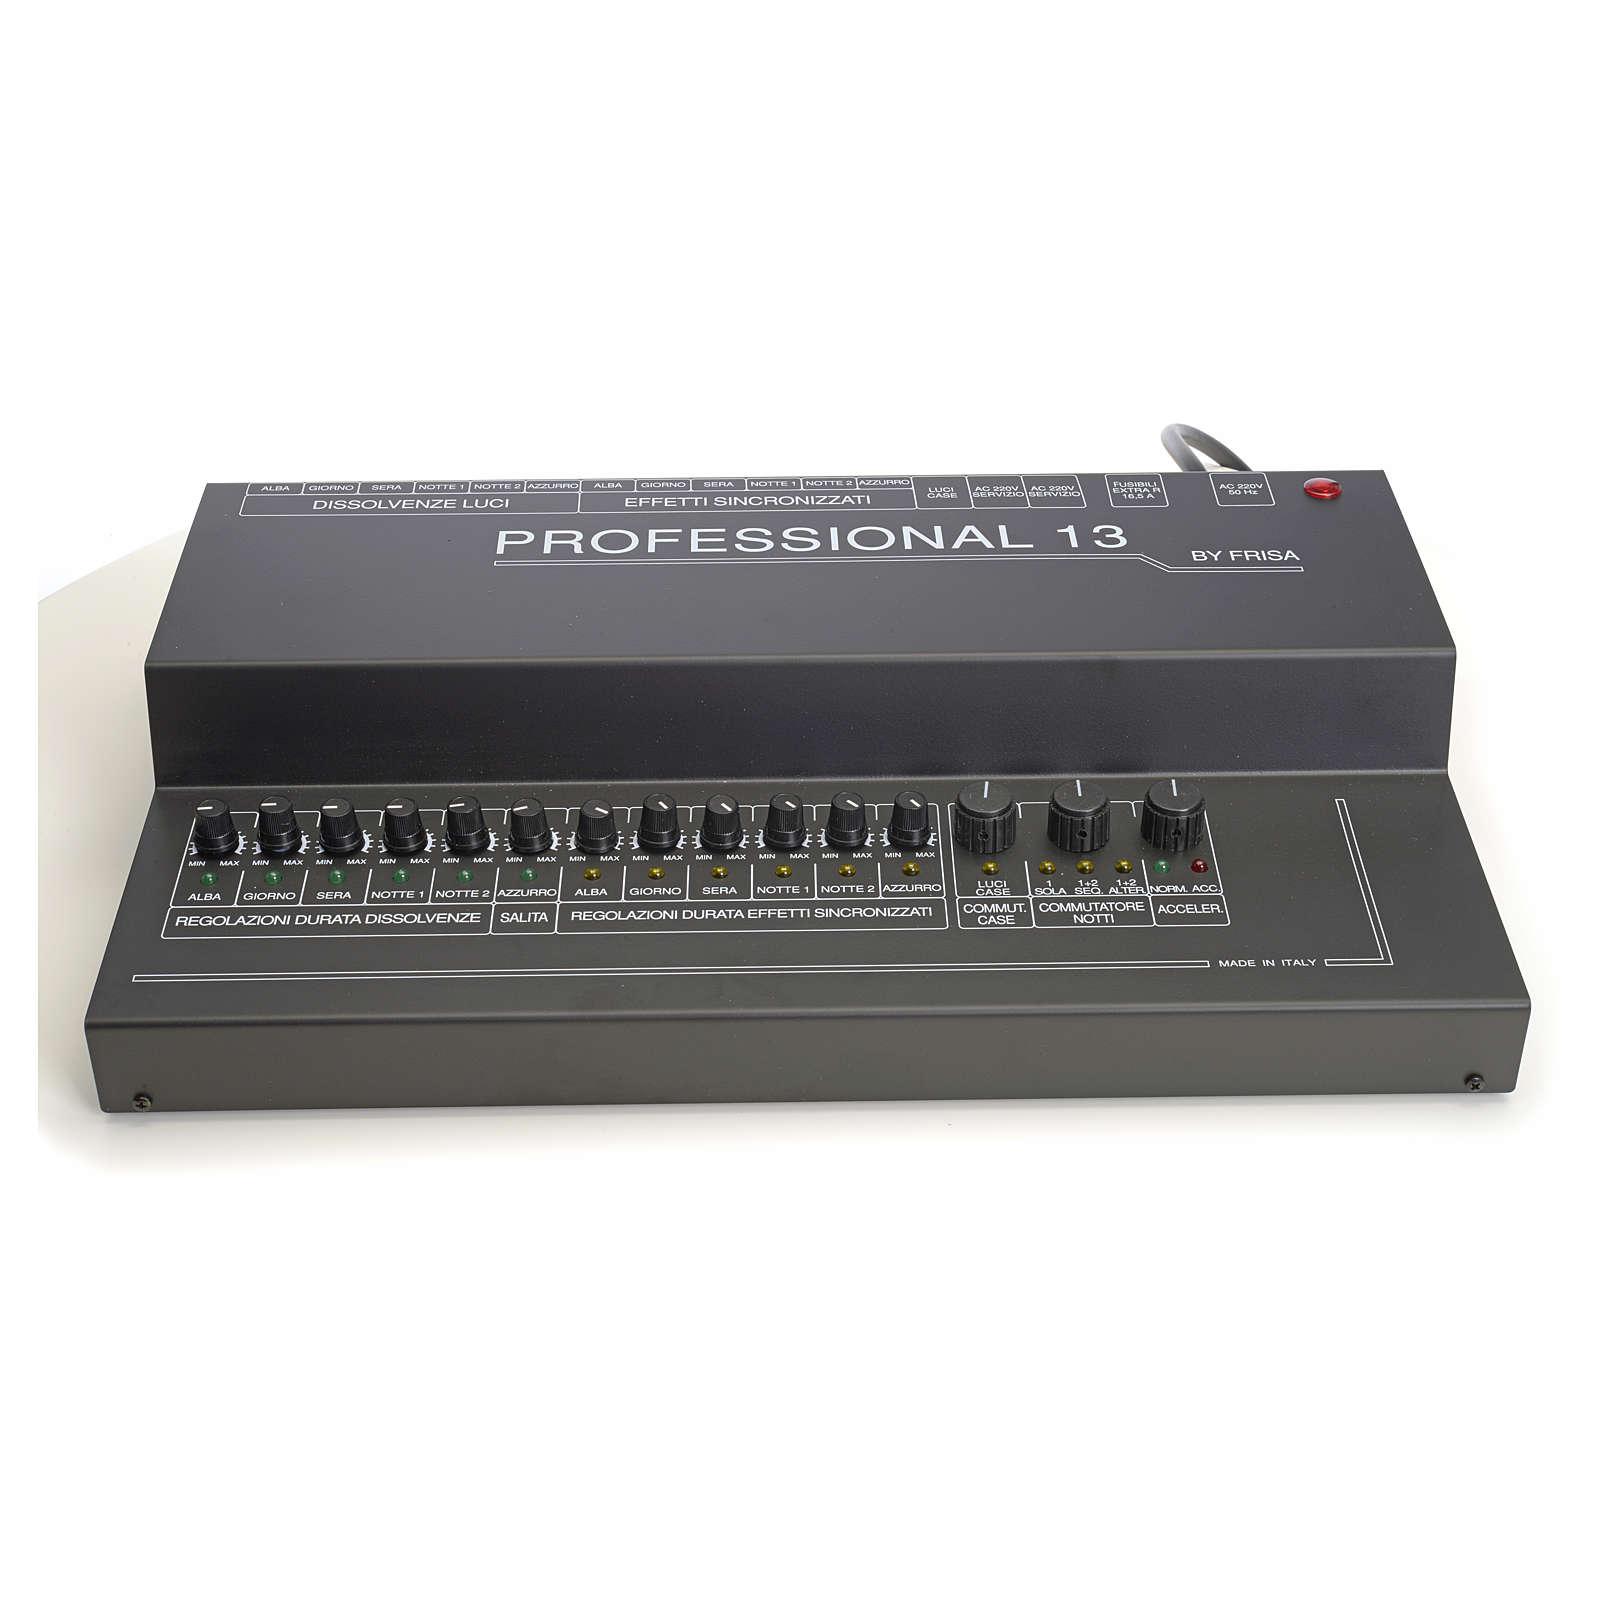 Professional 13 4